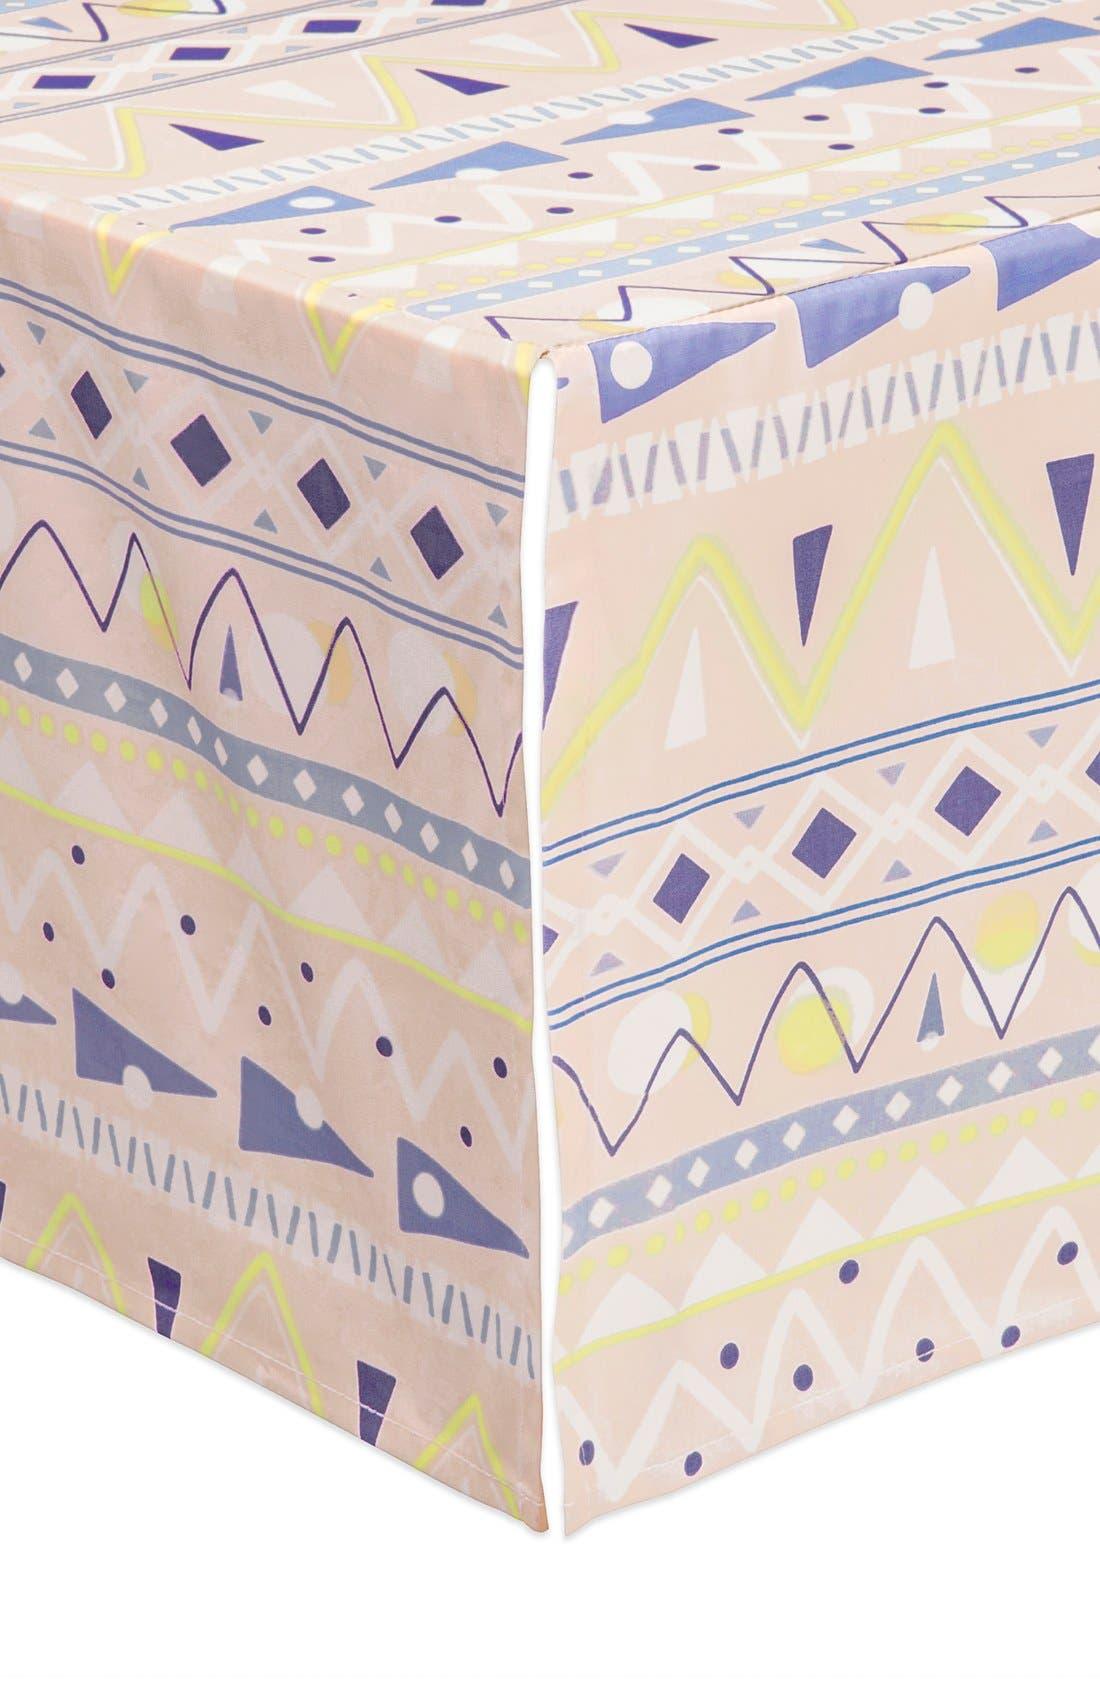 'Desert' Crib Sheet, Crib Skirt, Changing Pad Cover, Play Blanket, Stroller Blanket & Wall Decals,                             Alternate thumbnail 5, color,                             OFF WHITE